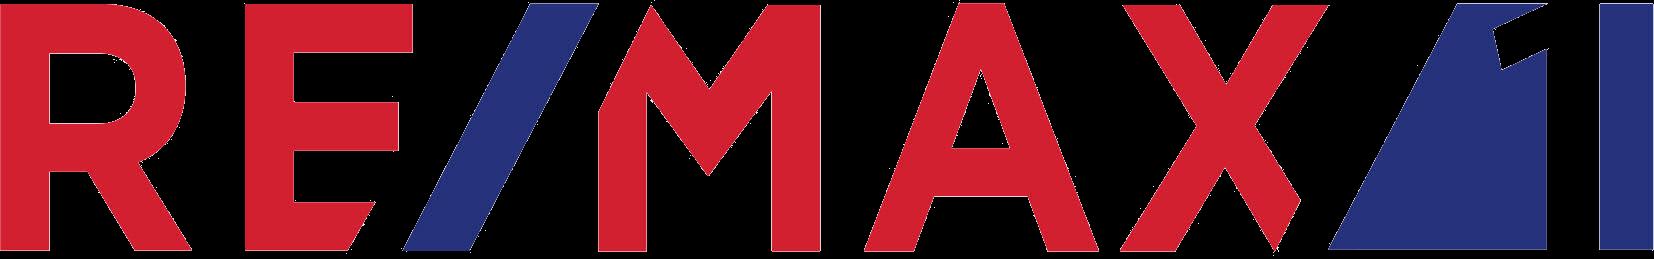 REMAX1 Logo Red Transparent (2)